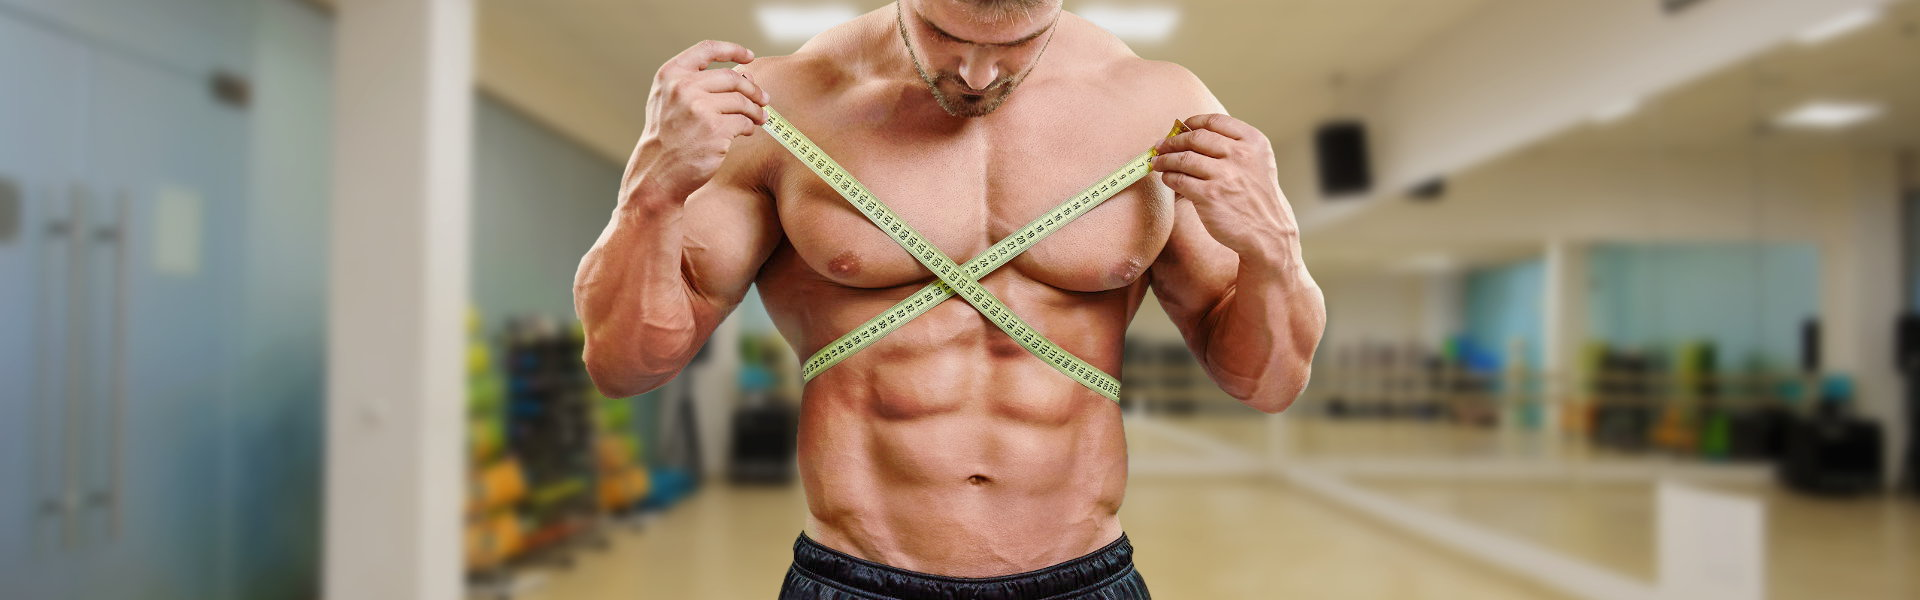 man taking body measurements